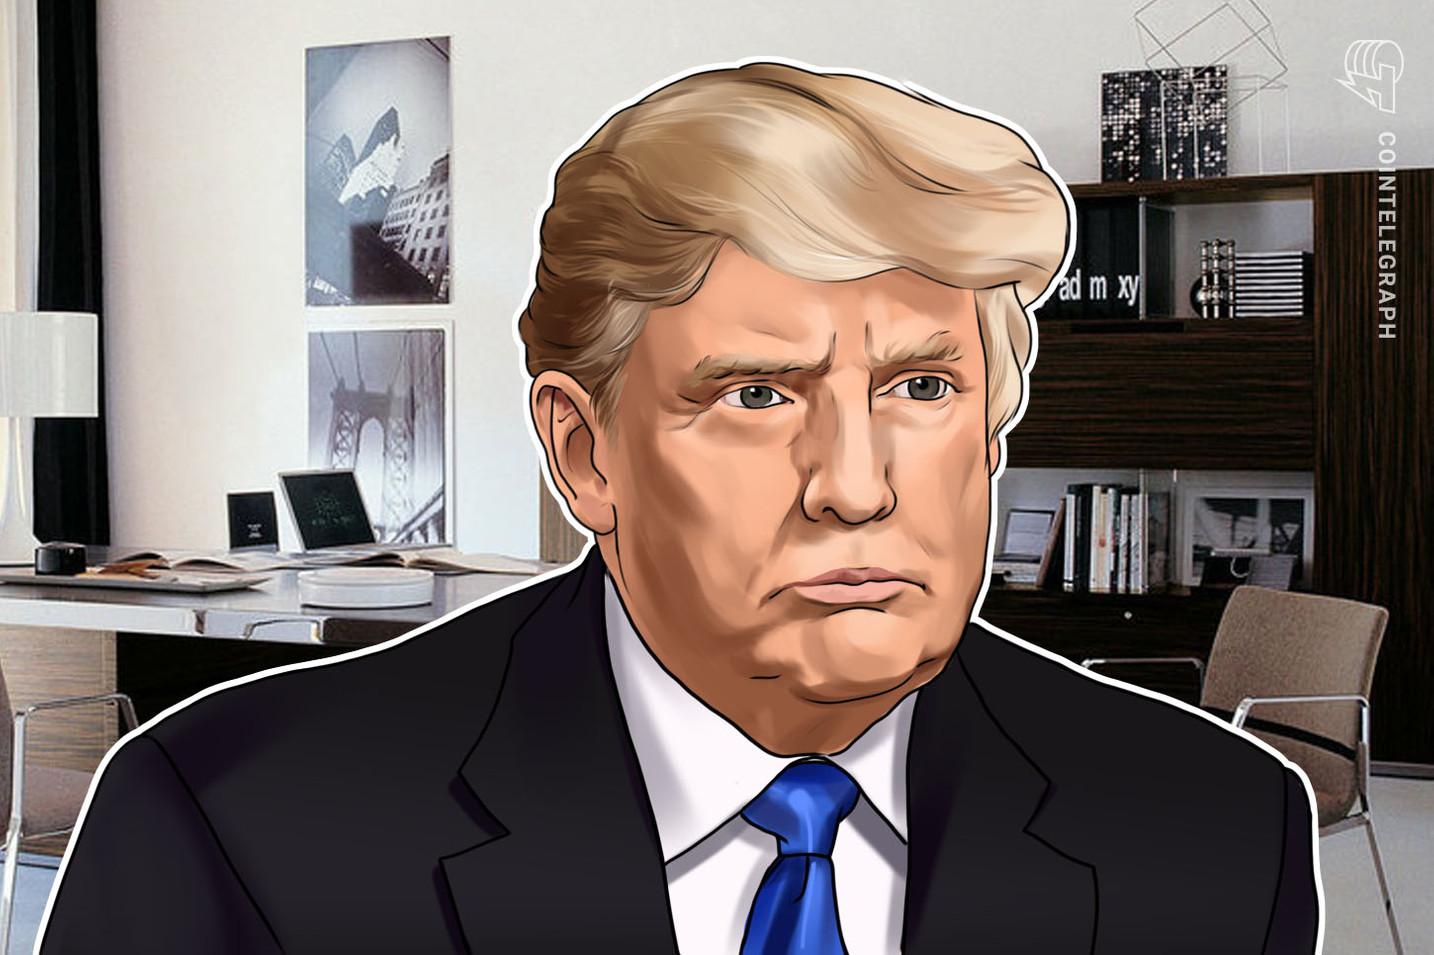 E-Zigarettenverbot in den USA: Sorge um Bitcoin-Verbot durch Trump